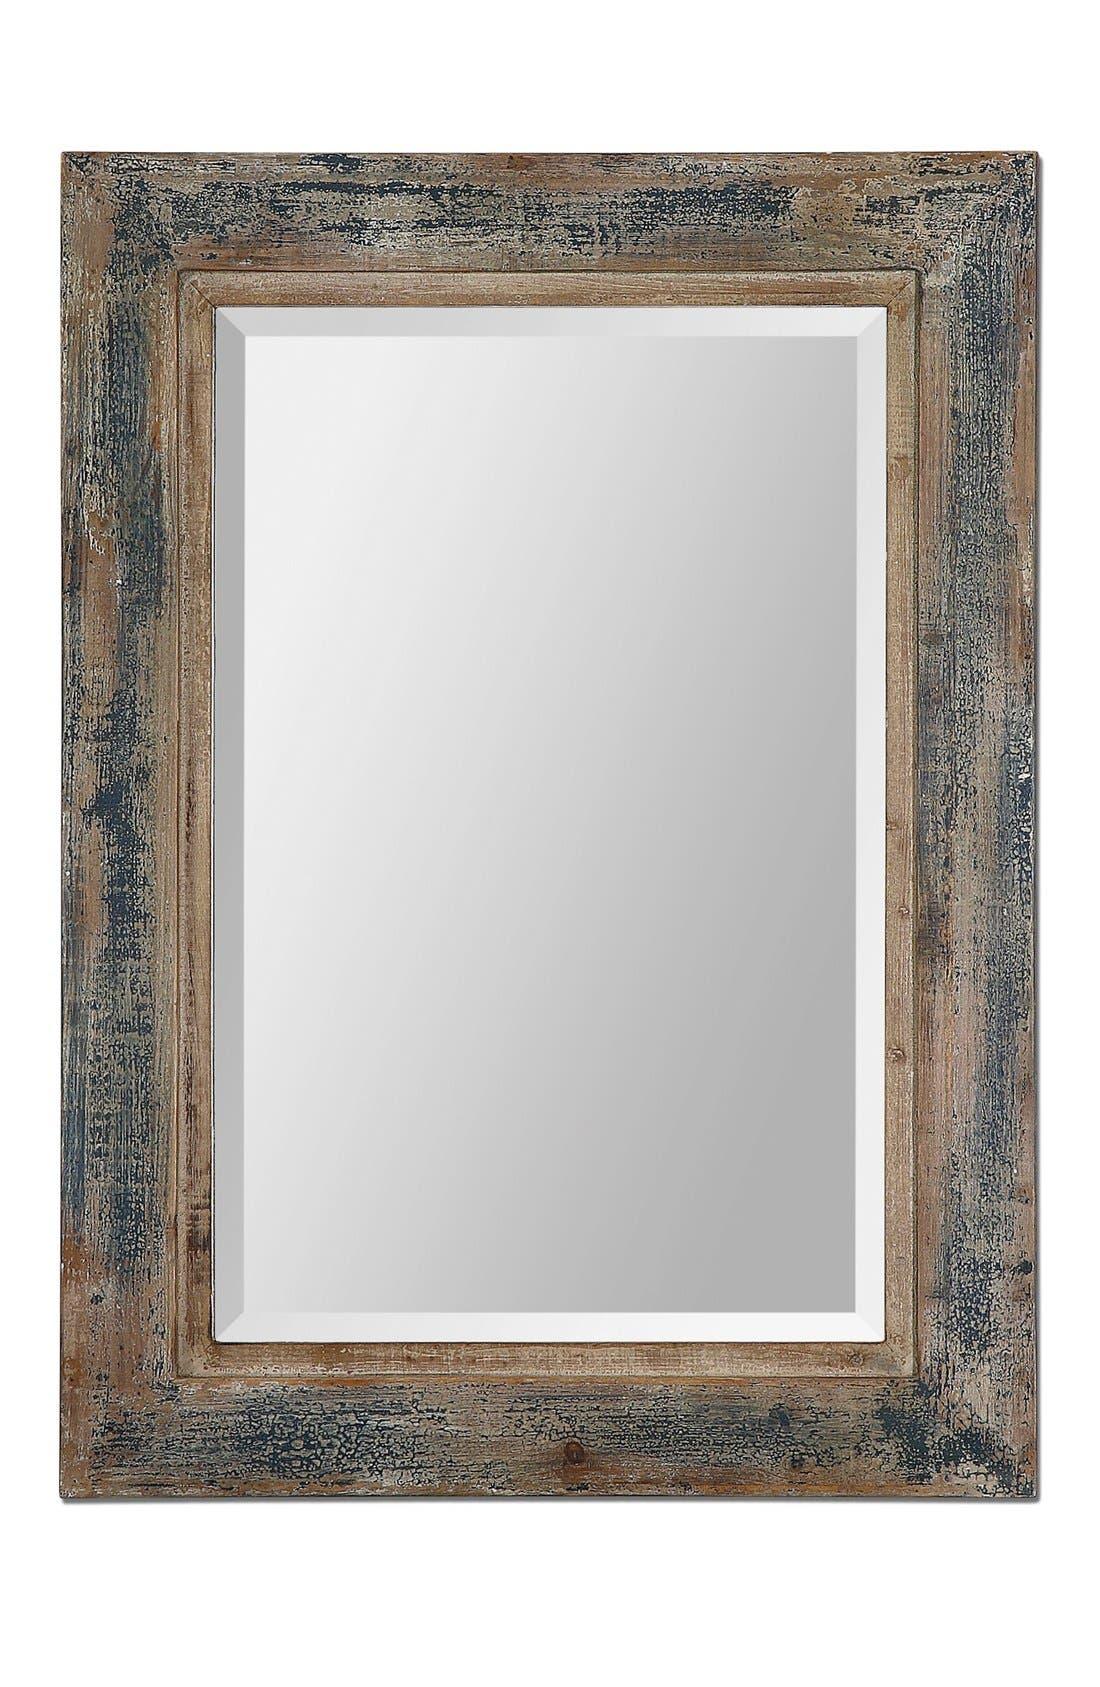 'Bozeman' Distressed Wooden Mirror,                         Main,                         color, Blue